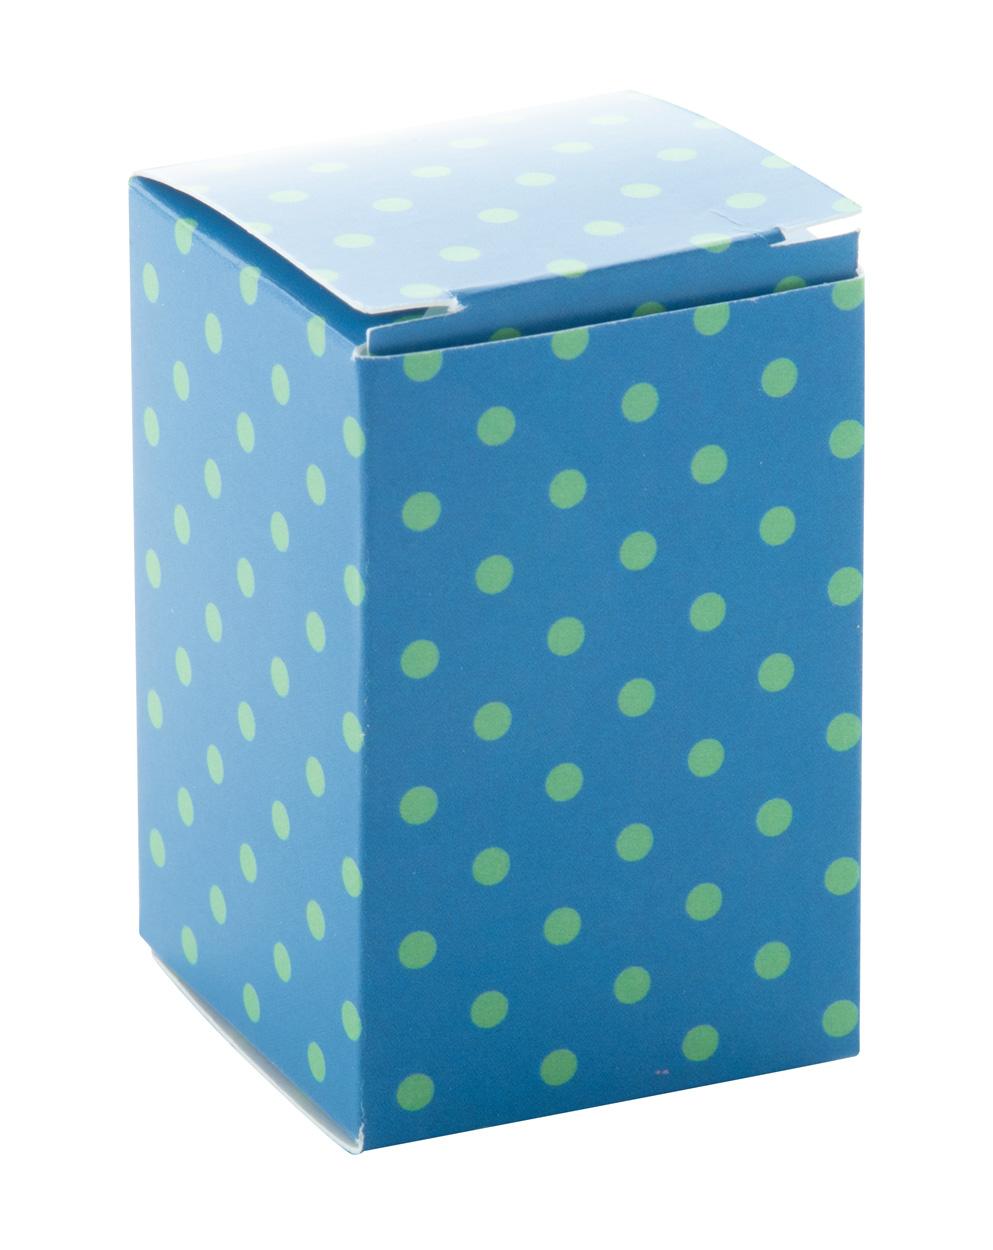 CreaBox Champagne Stopper A custom box